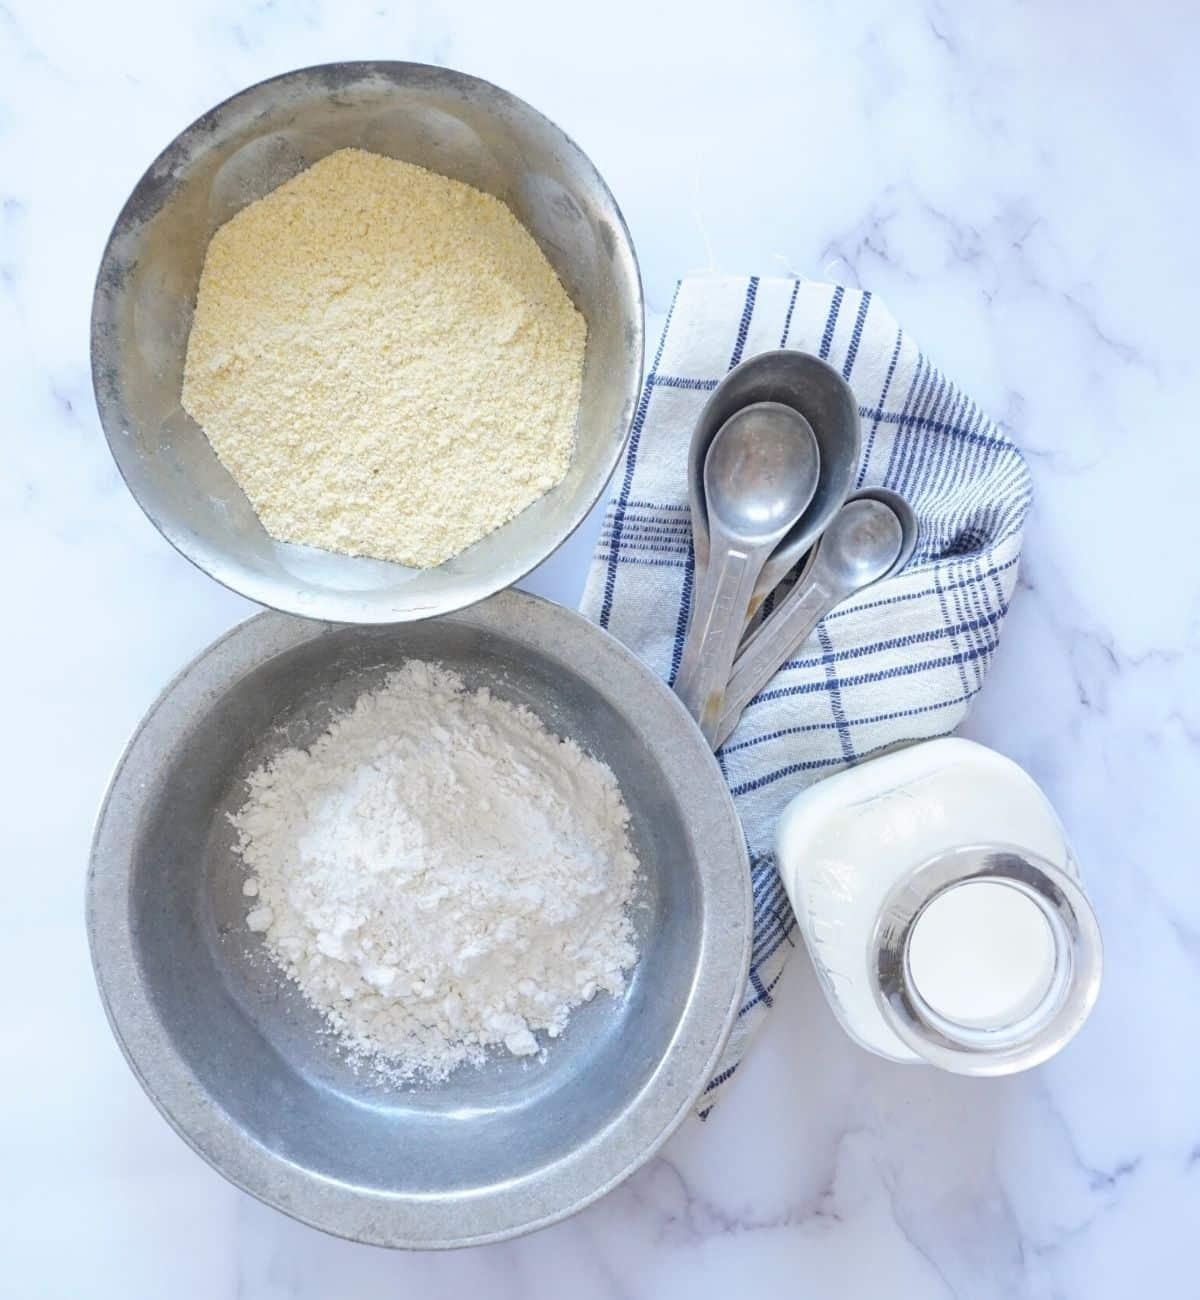 southern cornbread ingredients